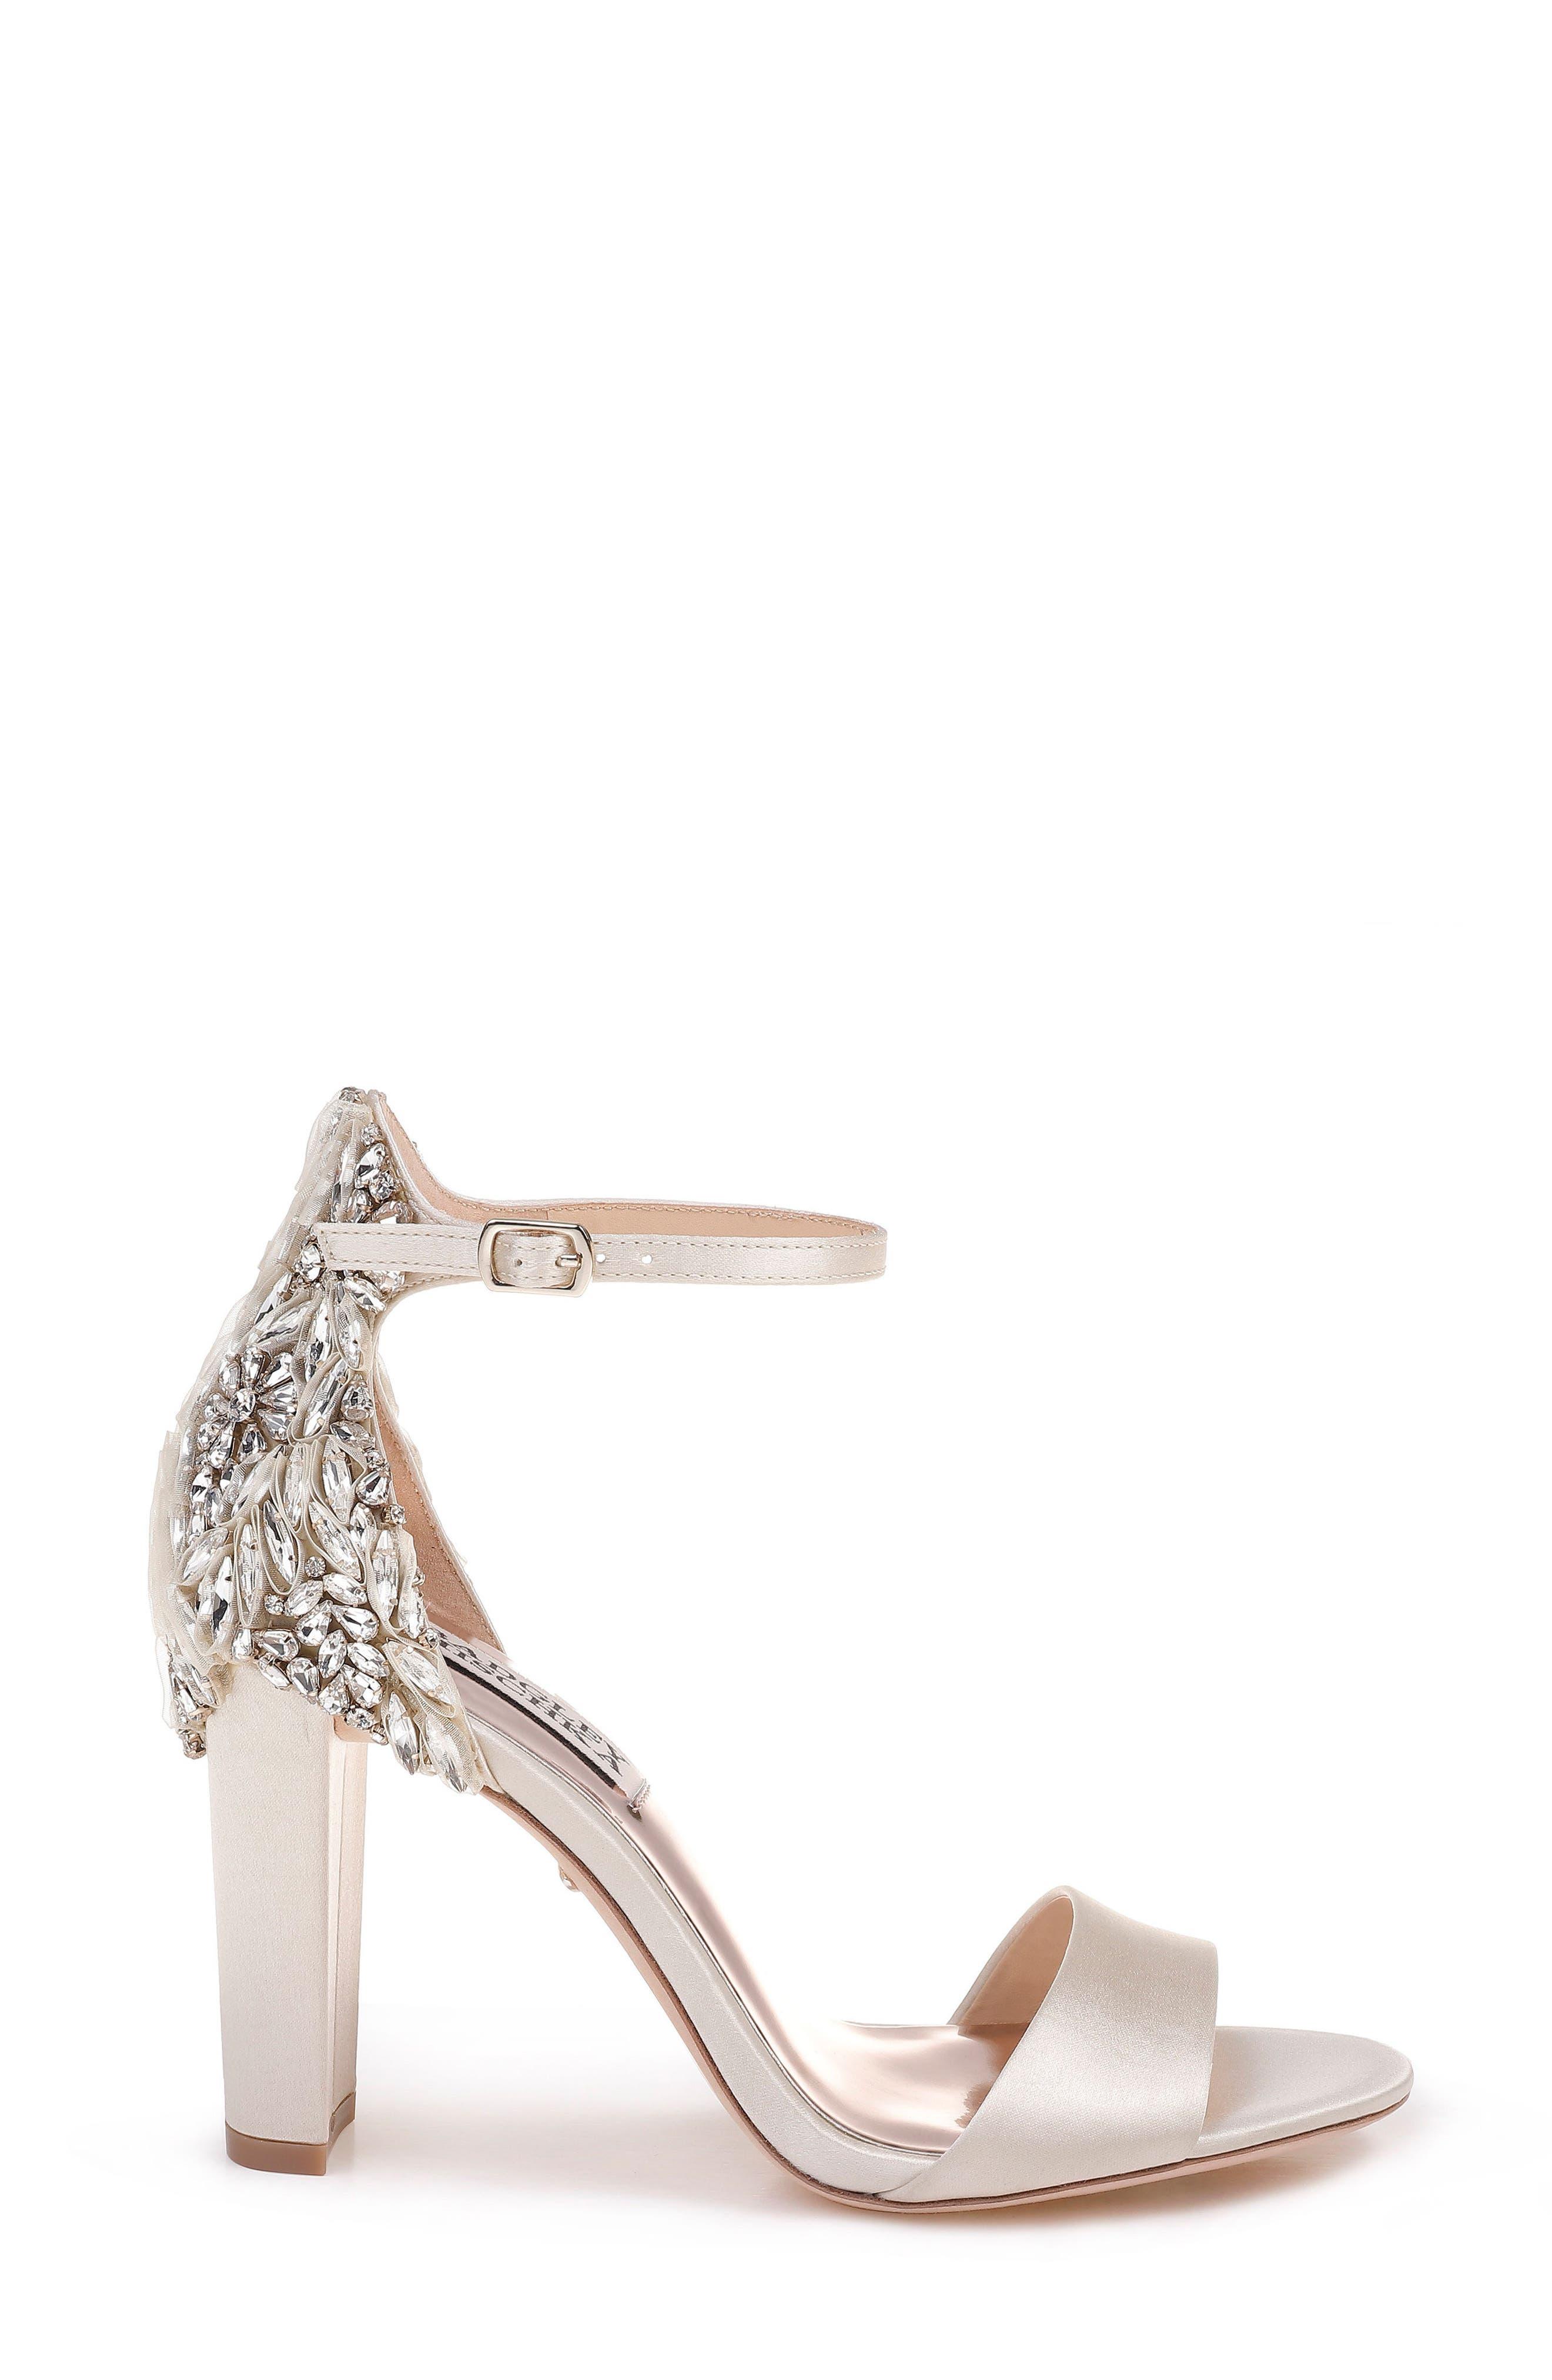 Alternate Image 3  - Badgley Mischka Seina Ankle Strap Sandal (Women)